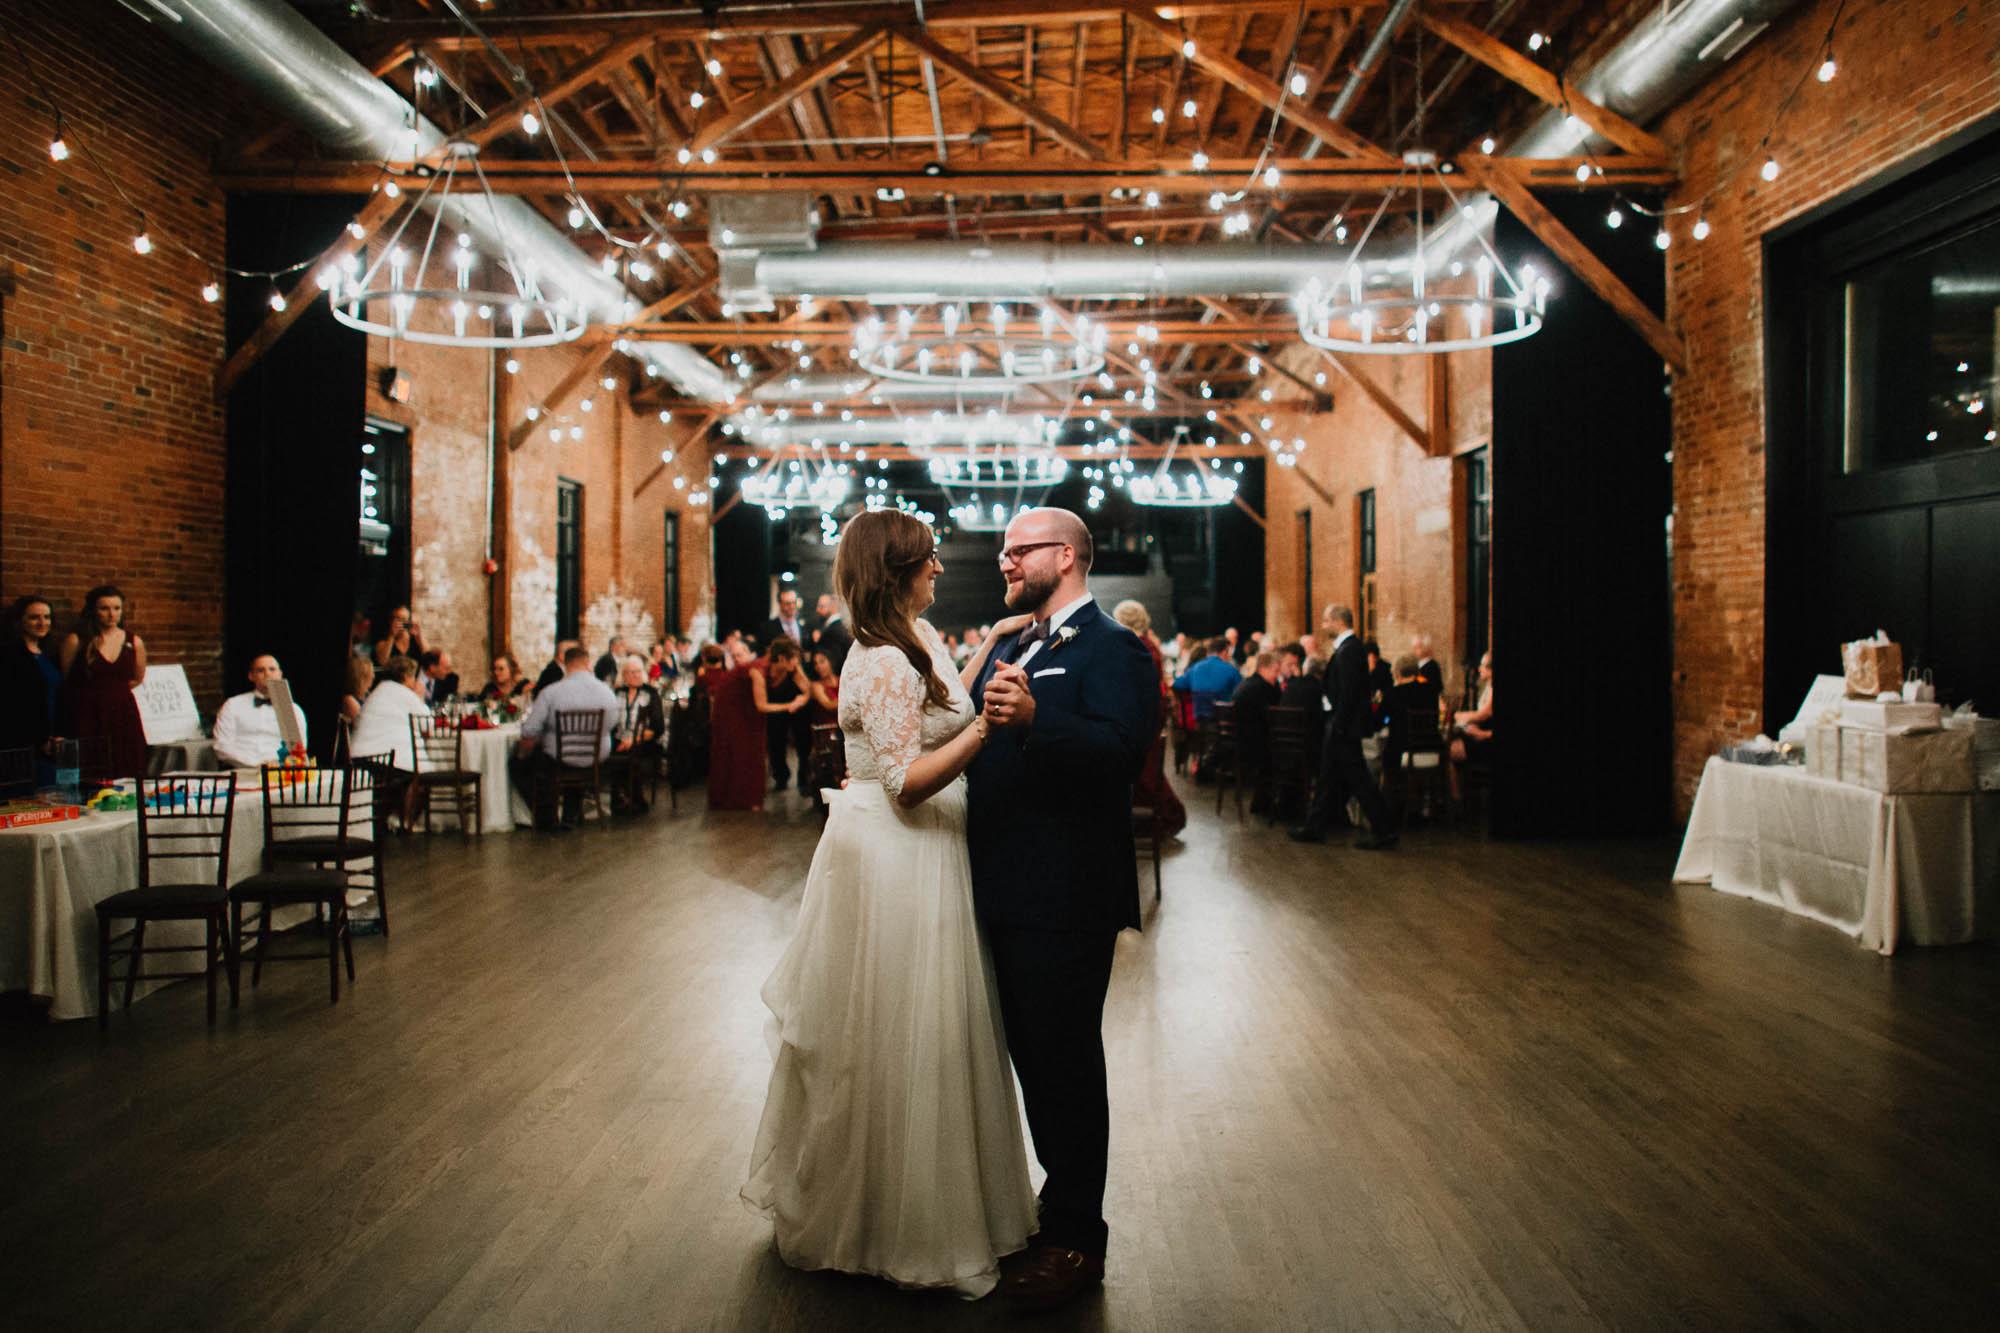 Highline-Car-House-Wedding-Columbus-Kristin-Aaron-110.jpg